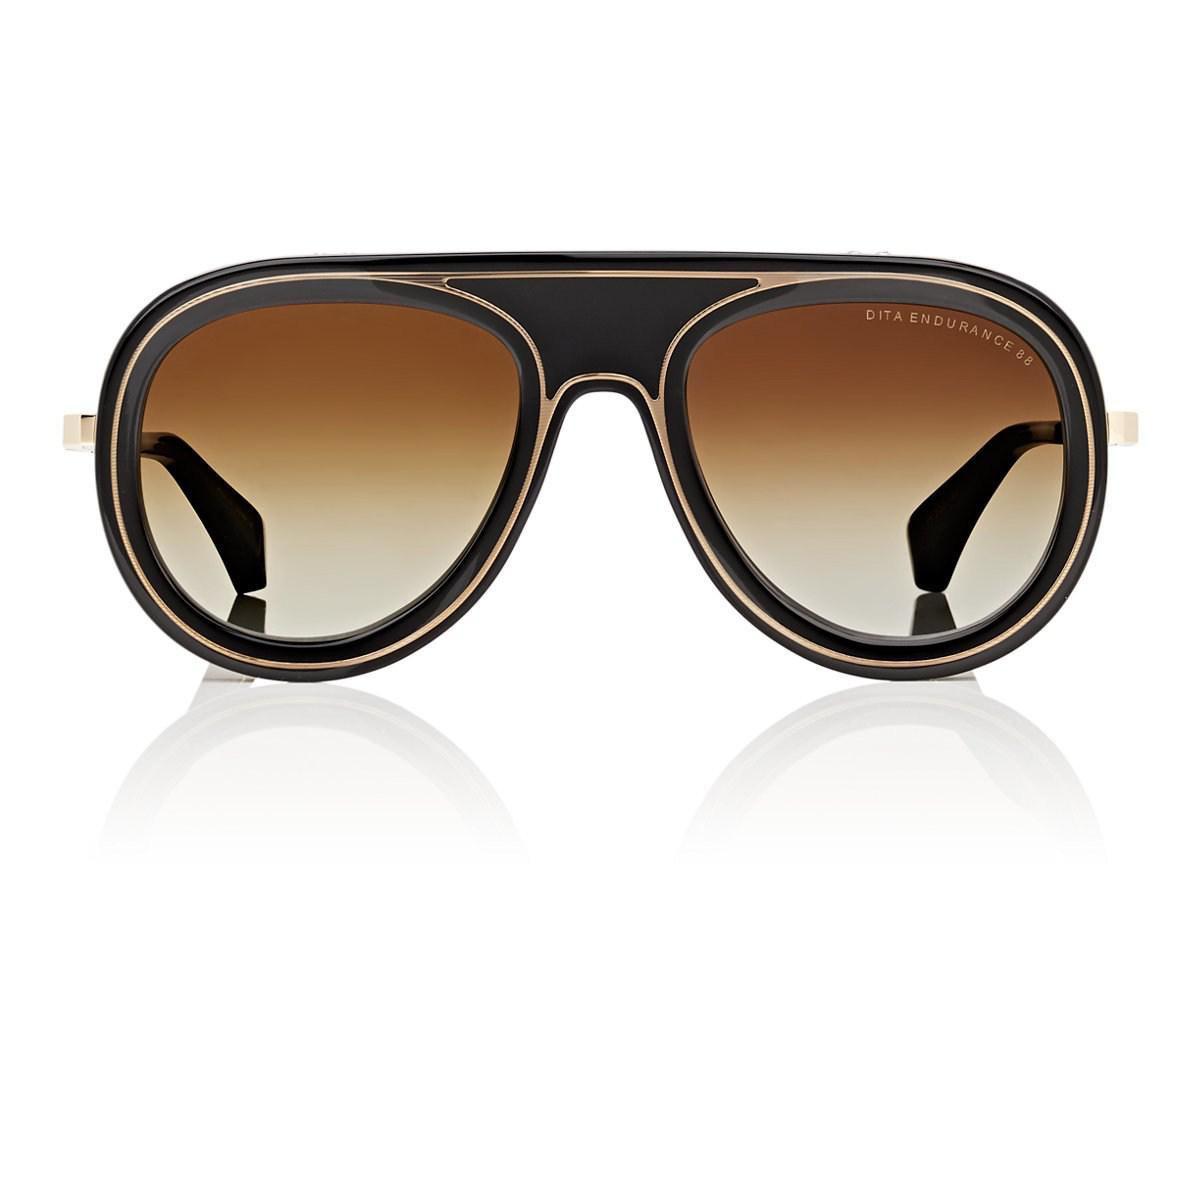 5236b5c9d97 Lyst - DITA Endurance 88 Sunglasses in Black for Men